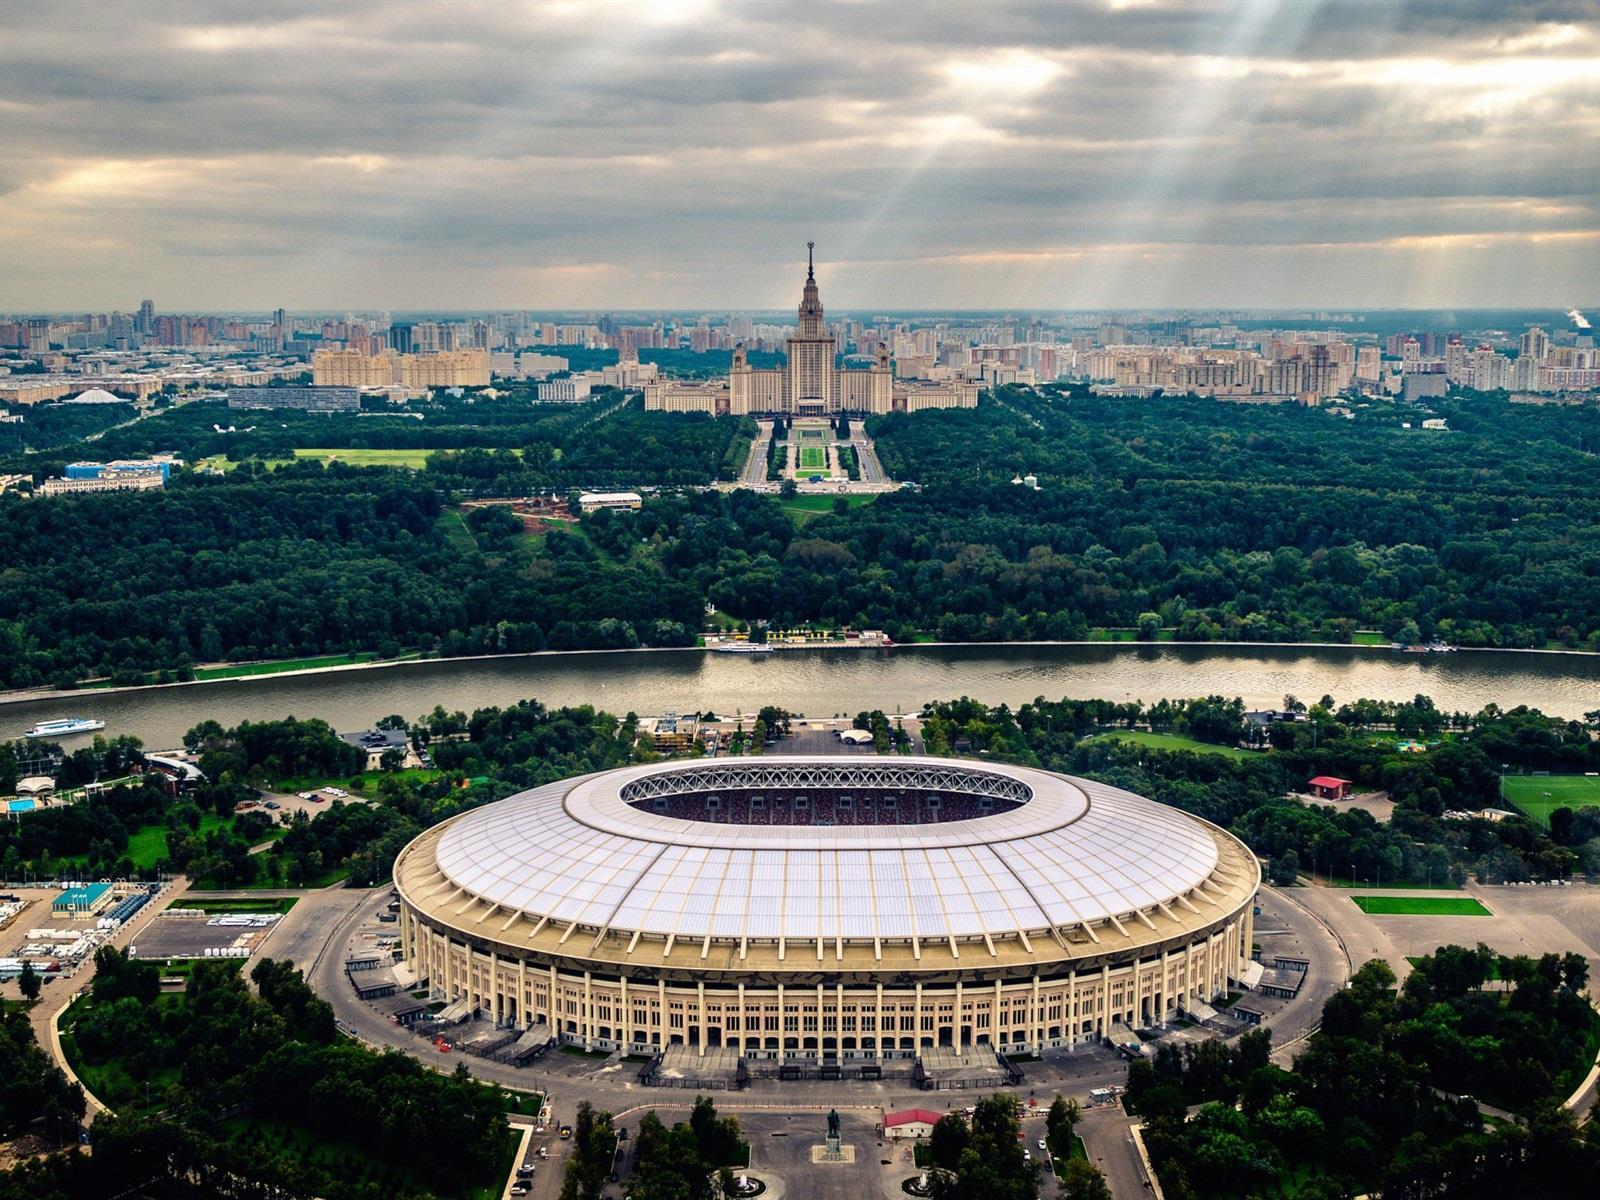 Tour estadio Olímpico Luzhnikí con panorámica